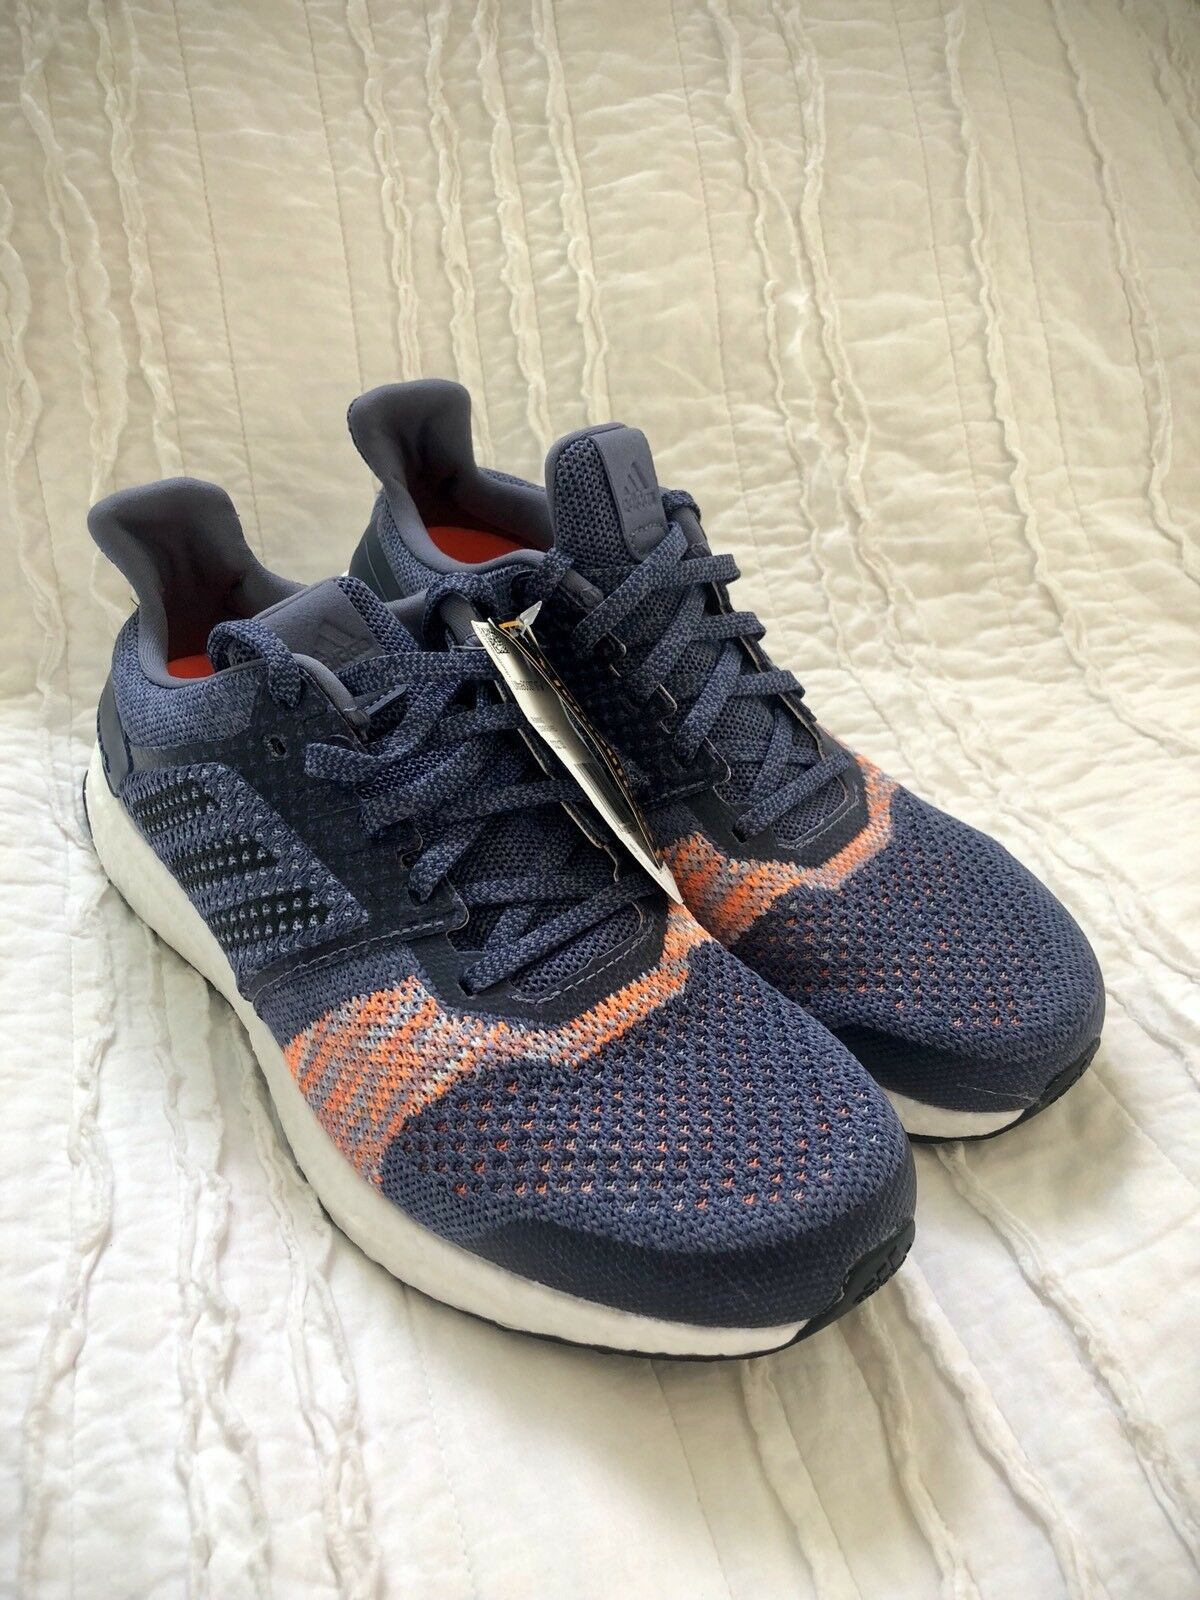 a9940b957afdb Women s Adidas UltraBOOST ST Running Shoes CQ2133 Size Size Size 10 Boost  Indigo Orange d24819